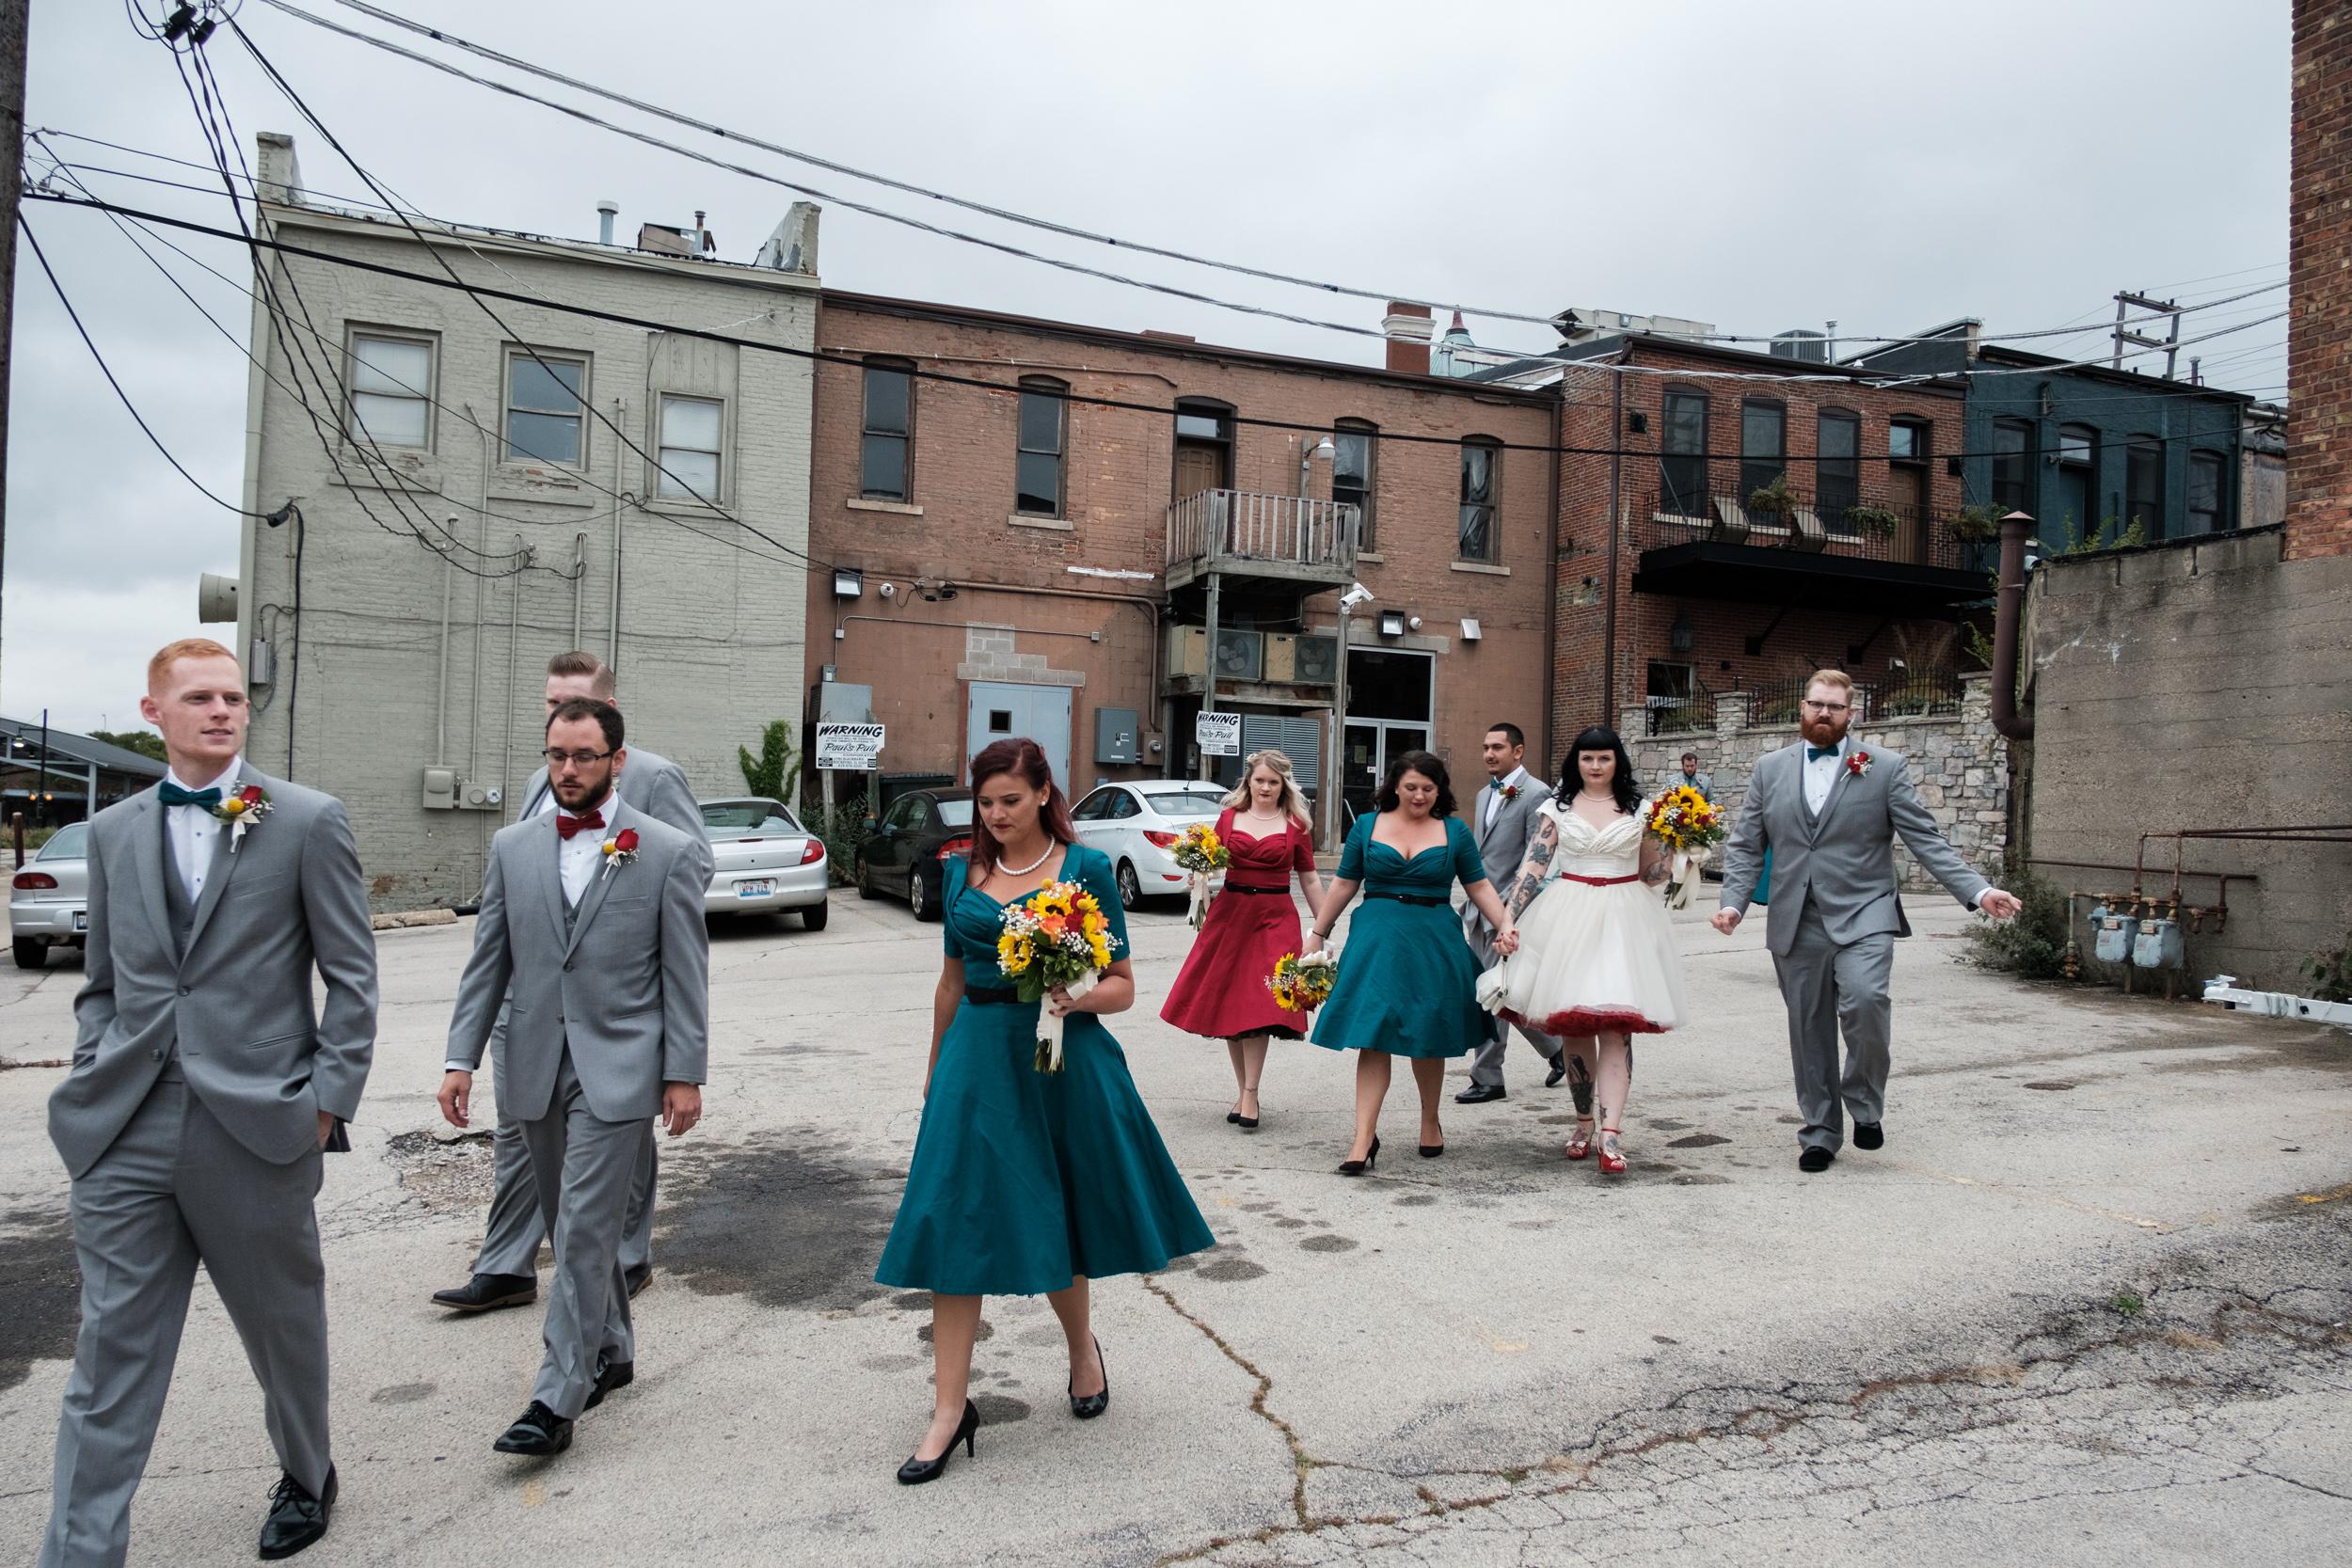 Christian & Sarah wedding photography by Brian milo-190.jpg